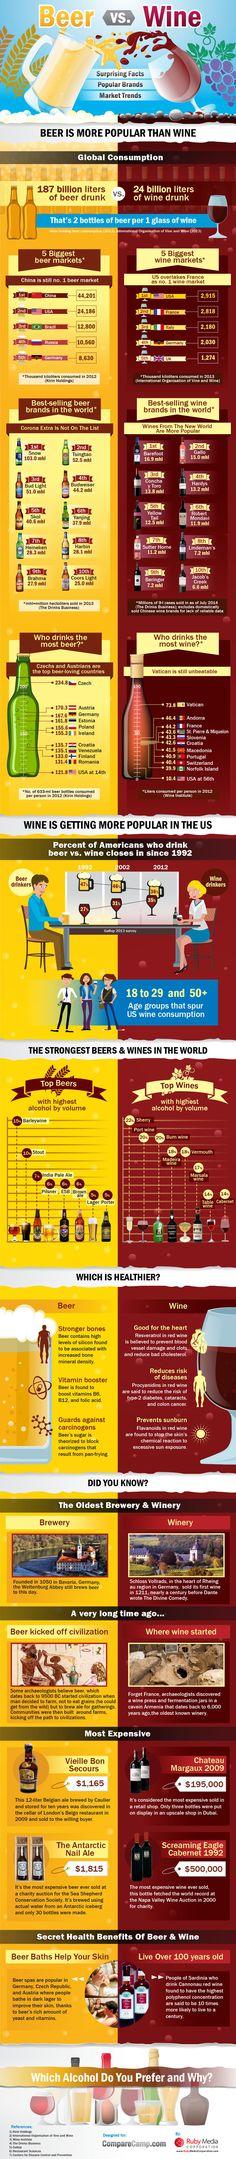 beer vs wine